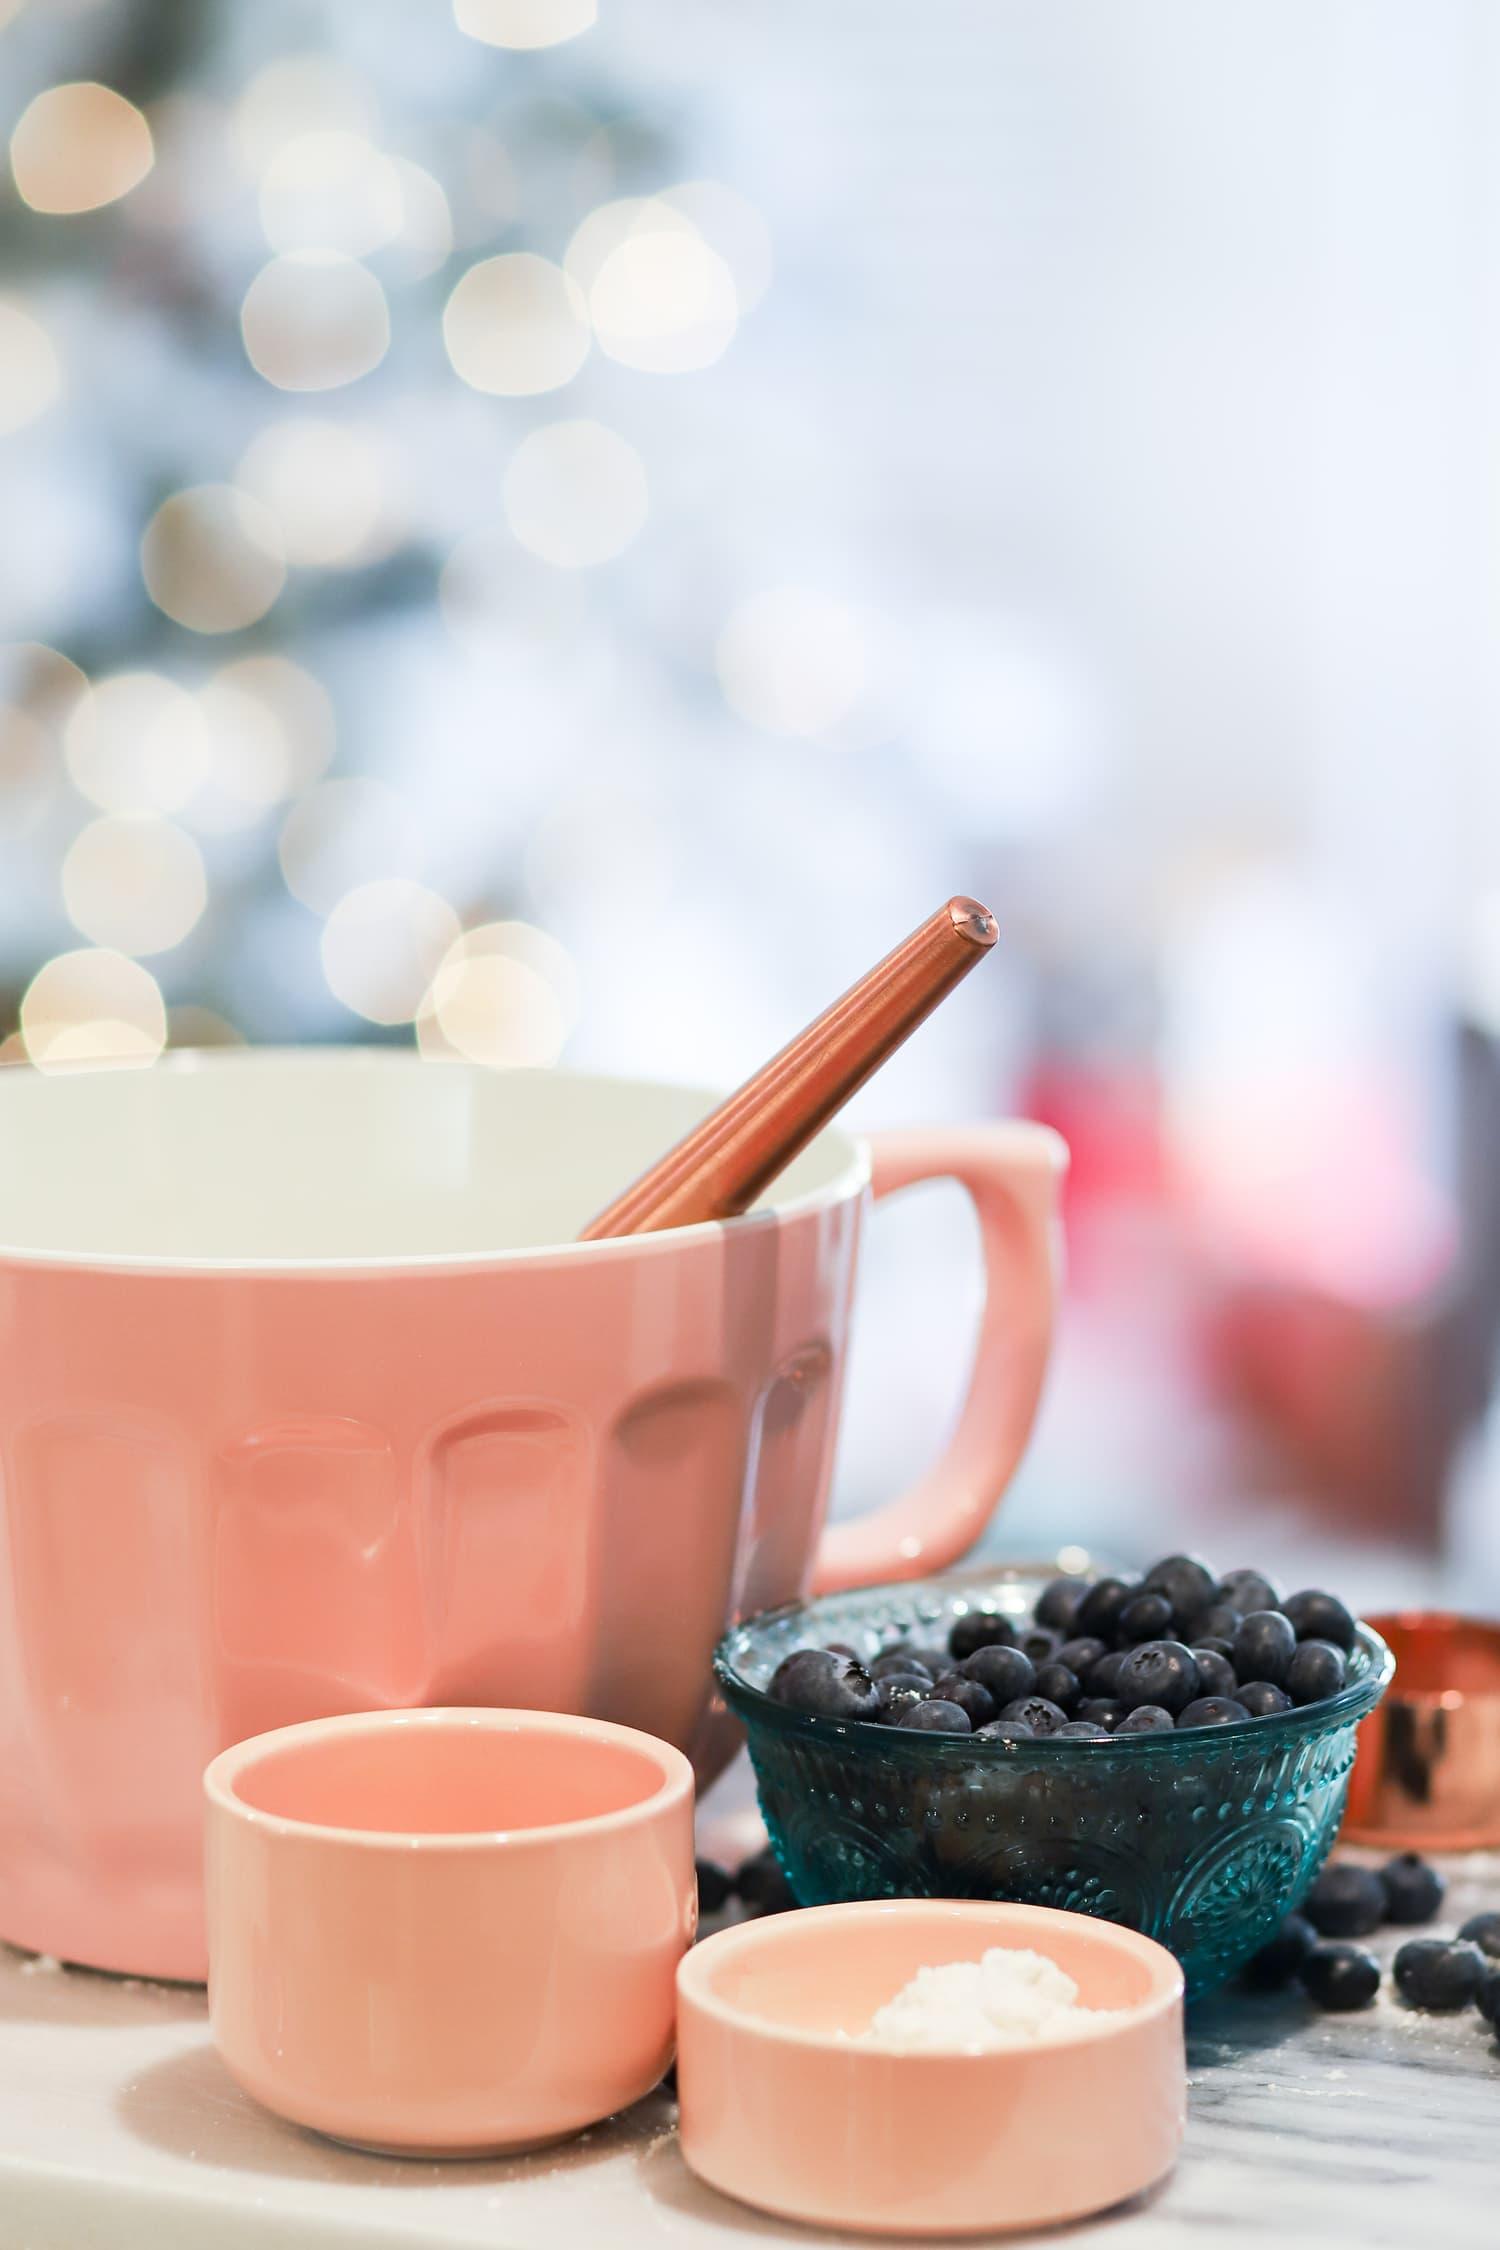 Manage stress around holidays pancake breakfast blueberries   Ashley Brooke Nicholas